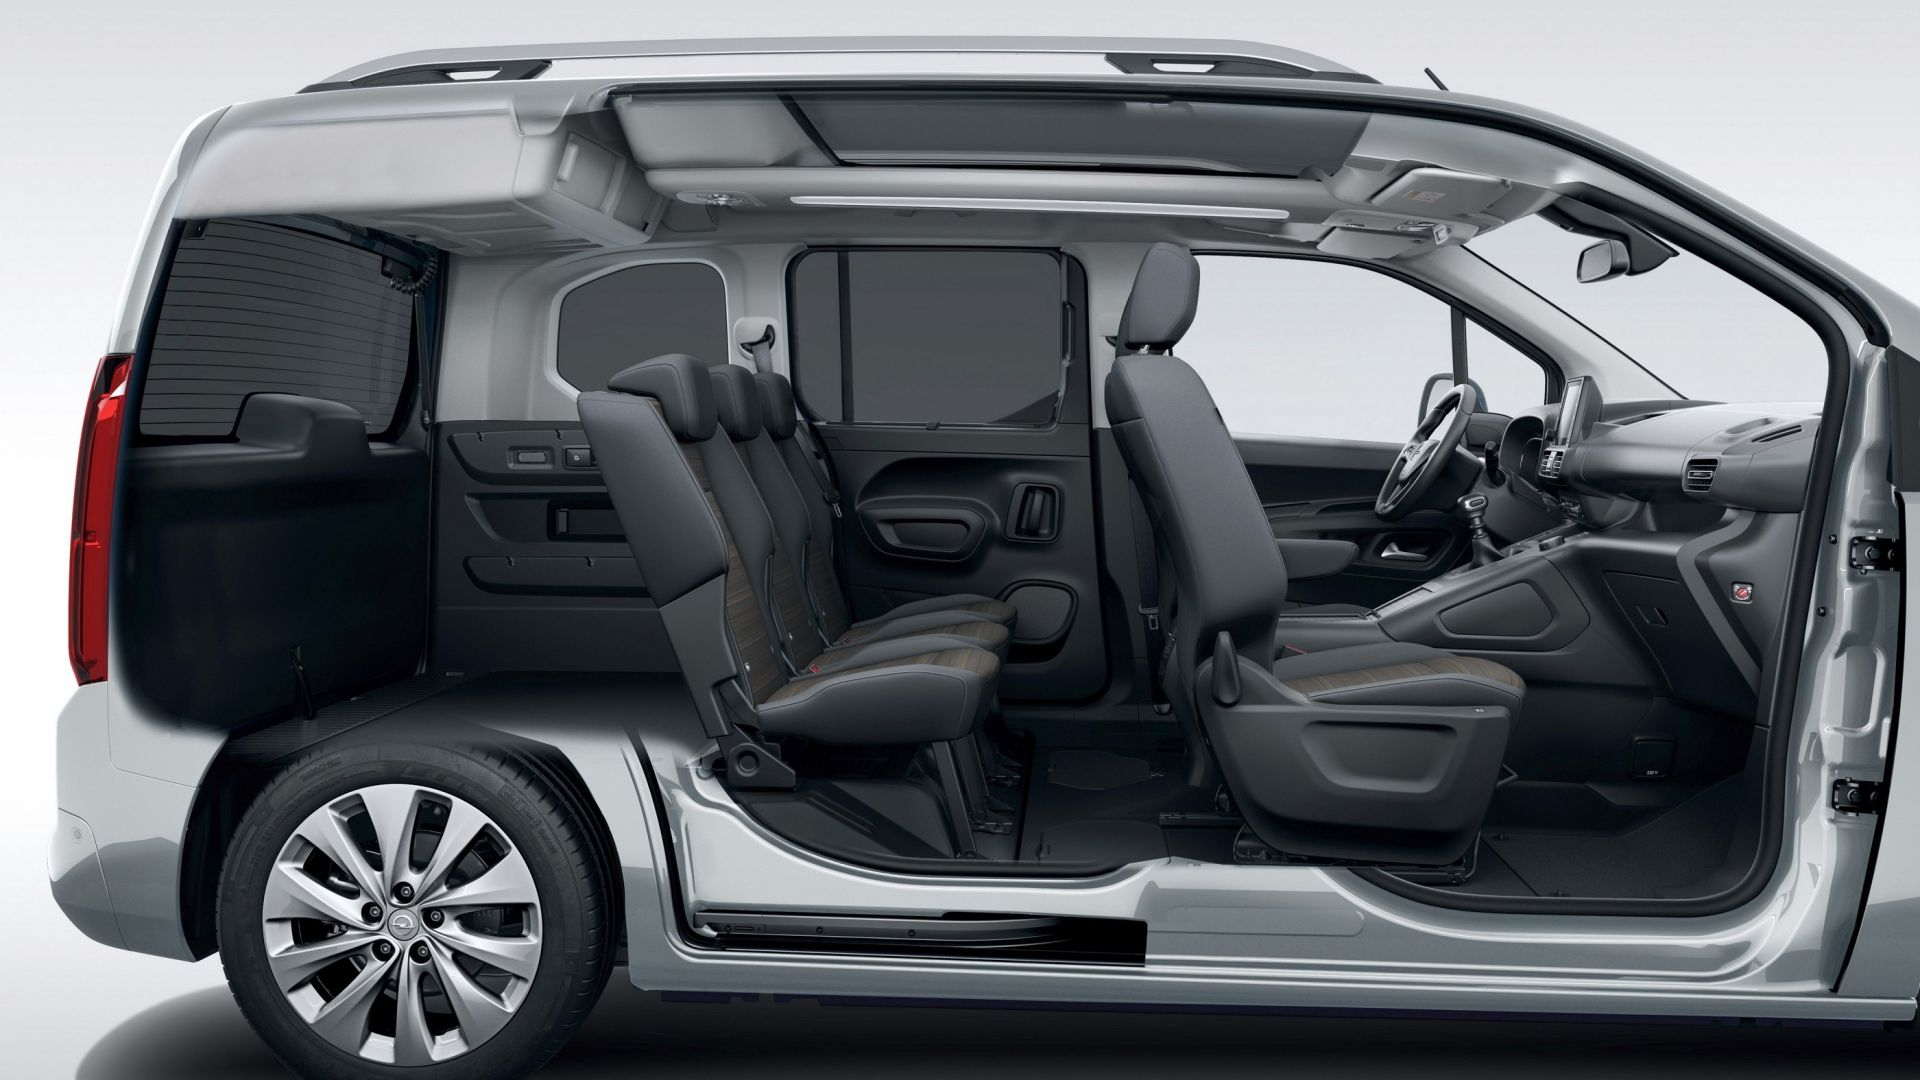 Nuovo Opel Combo Life 2018: dimensioni, 5 o 7 posti e ...